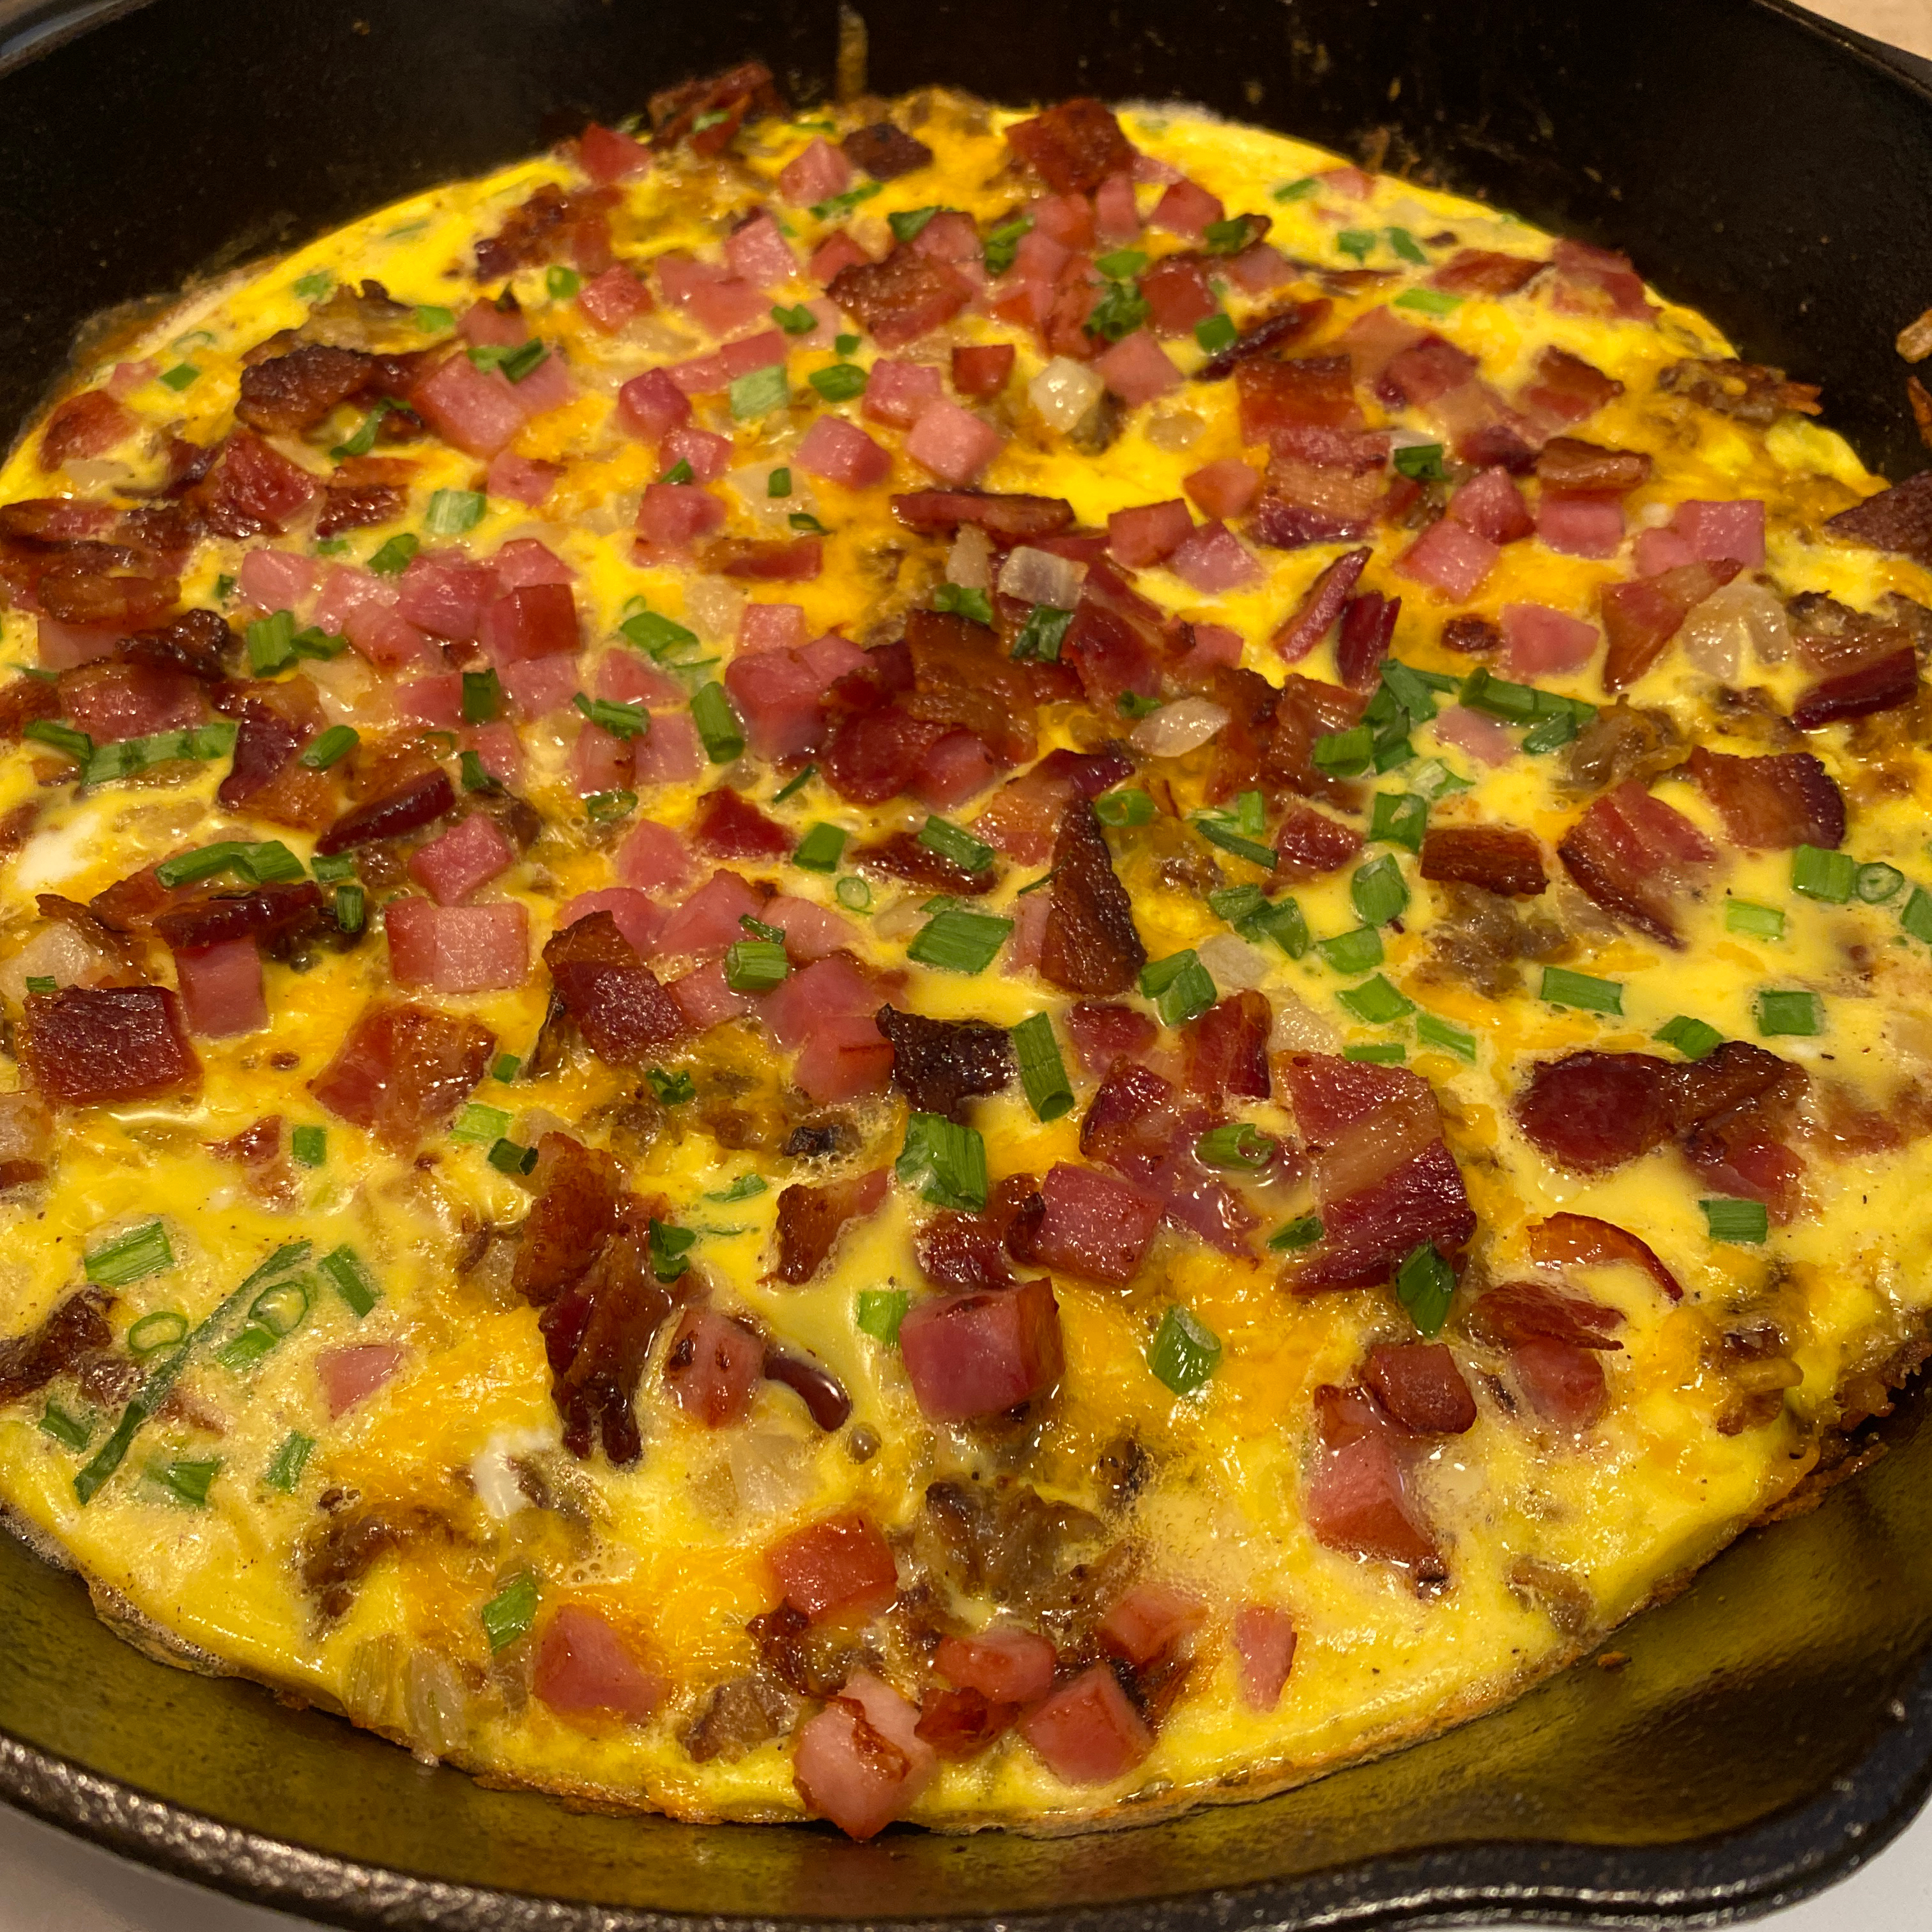 Cheesy Bacon-Sausage-Egg-Hash Brown Skillet